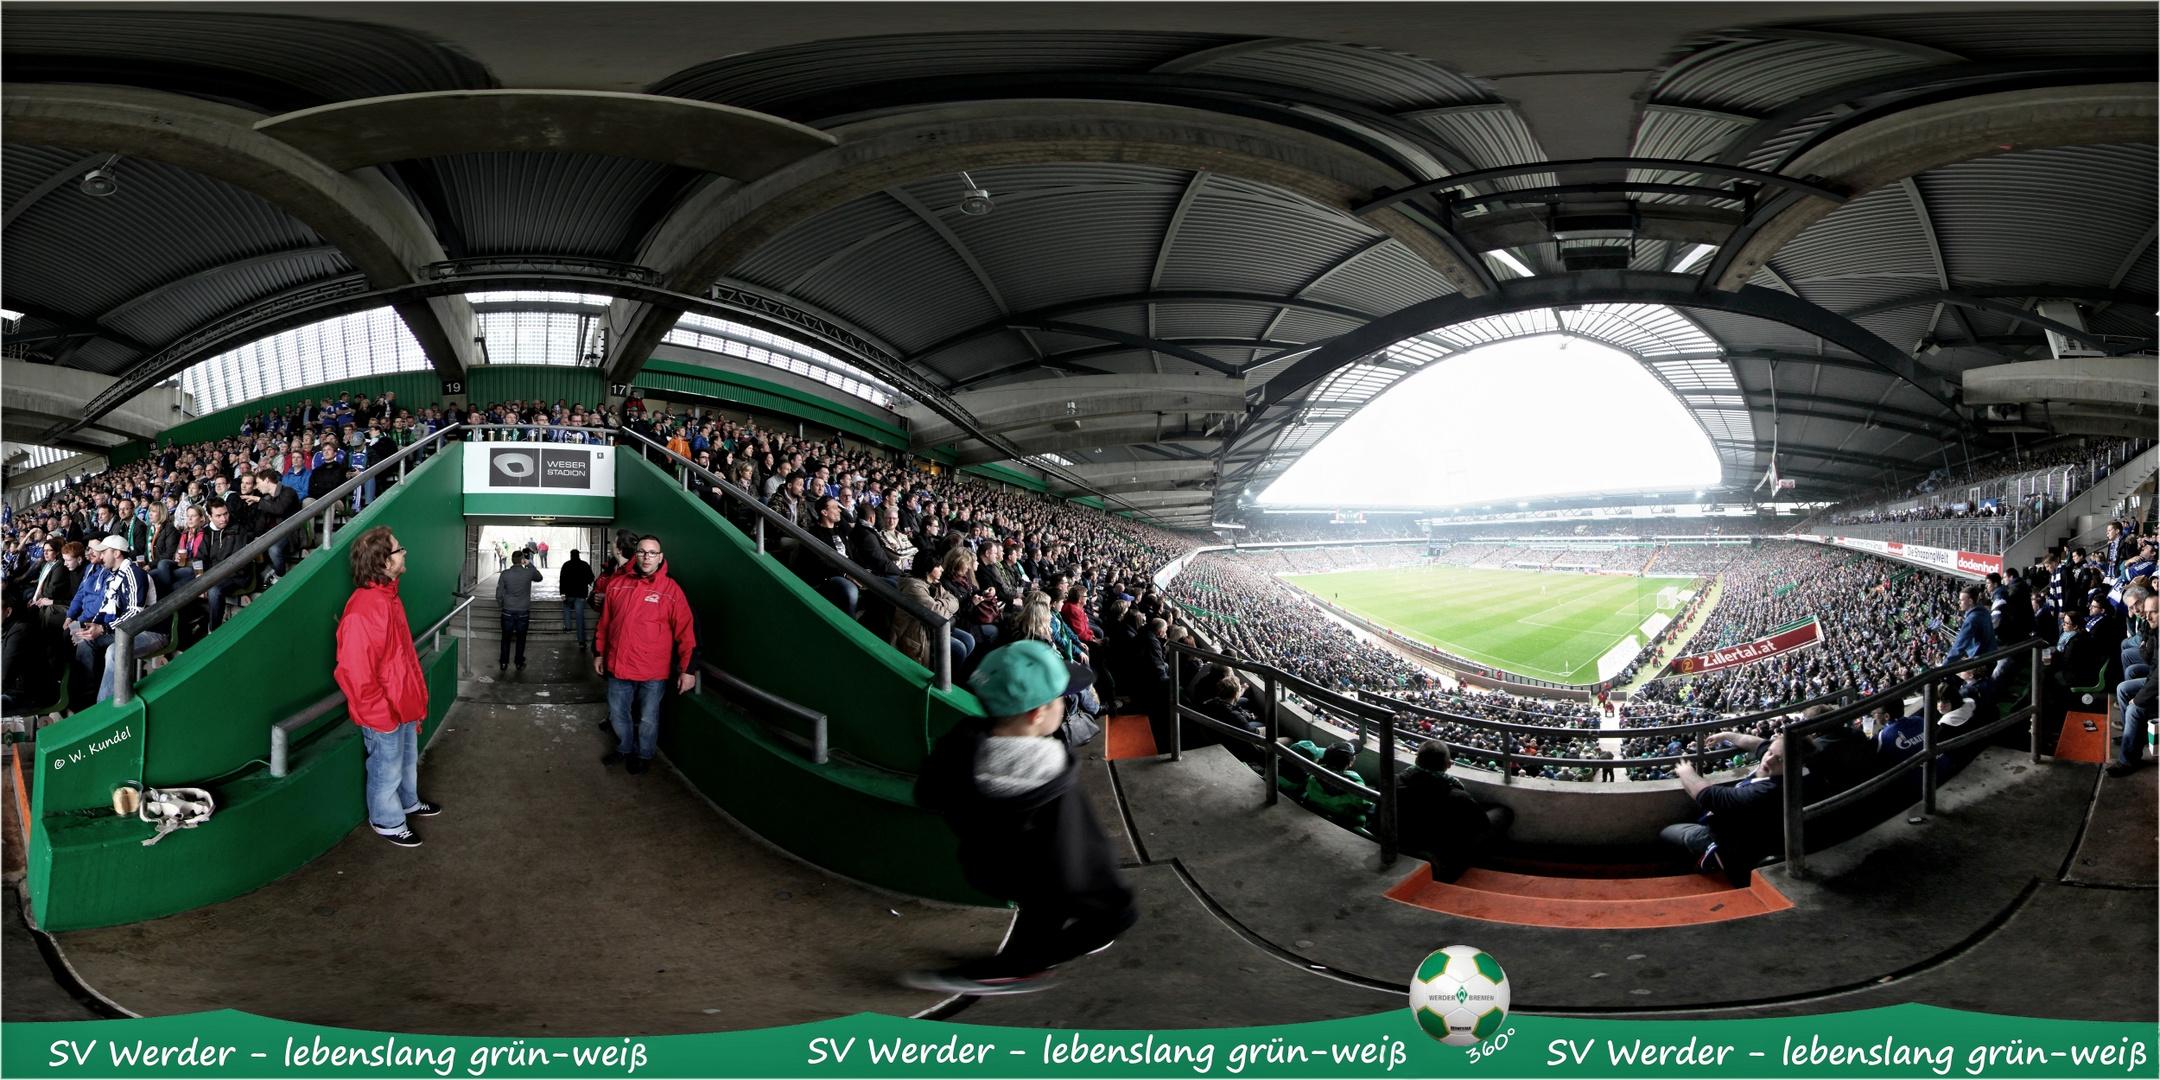 Panorama lebenslang grün-weiß im Weserstadion